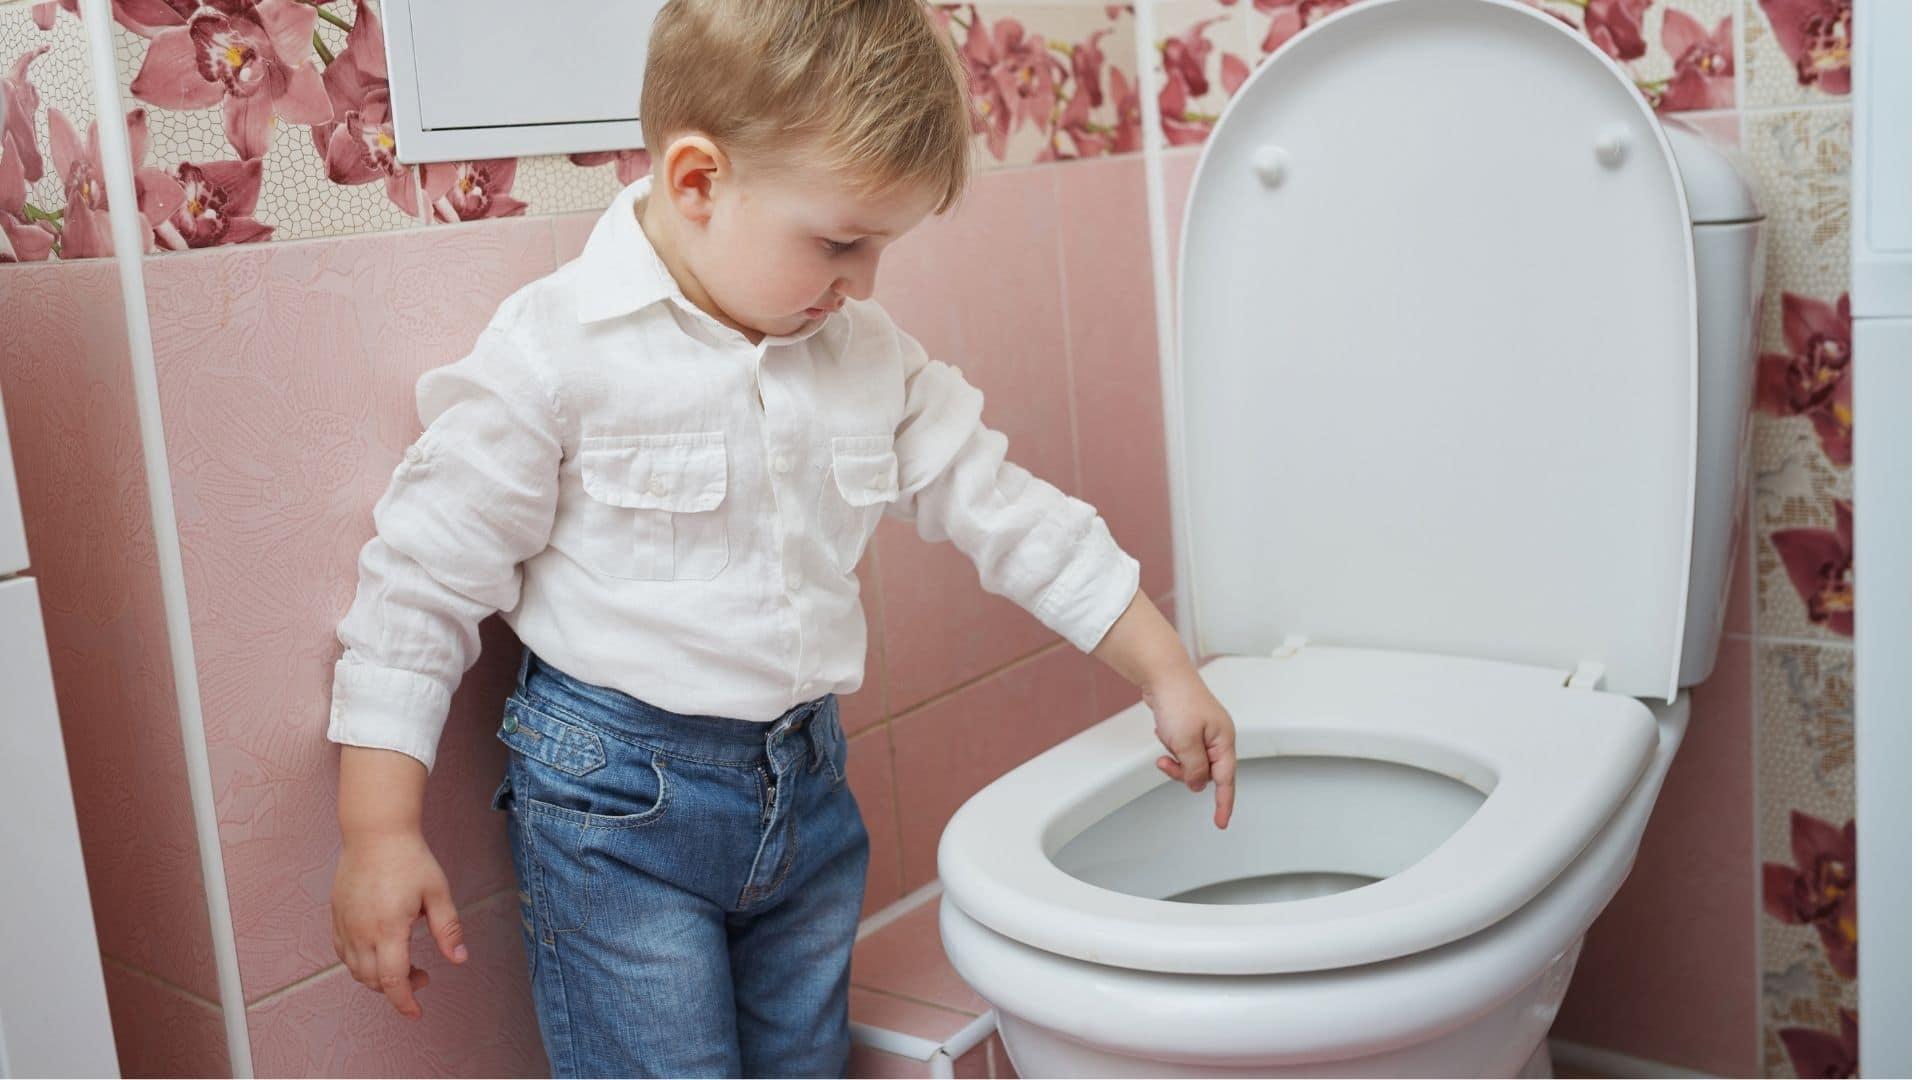 toddler pointing inside toilet